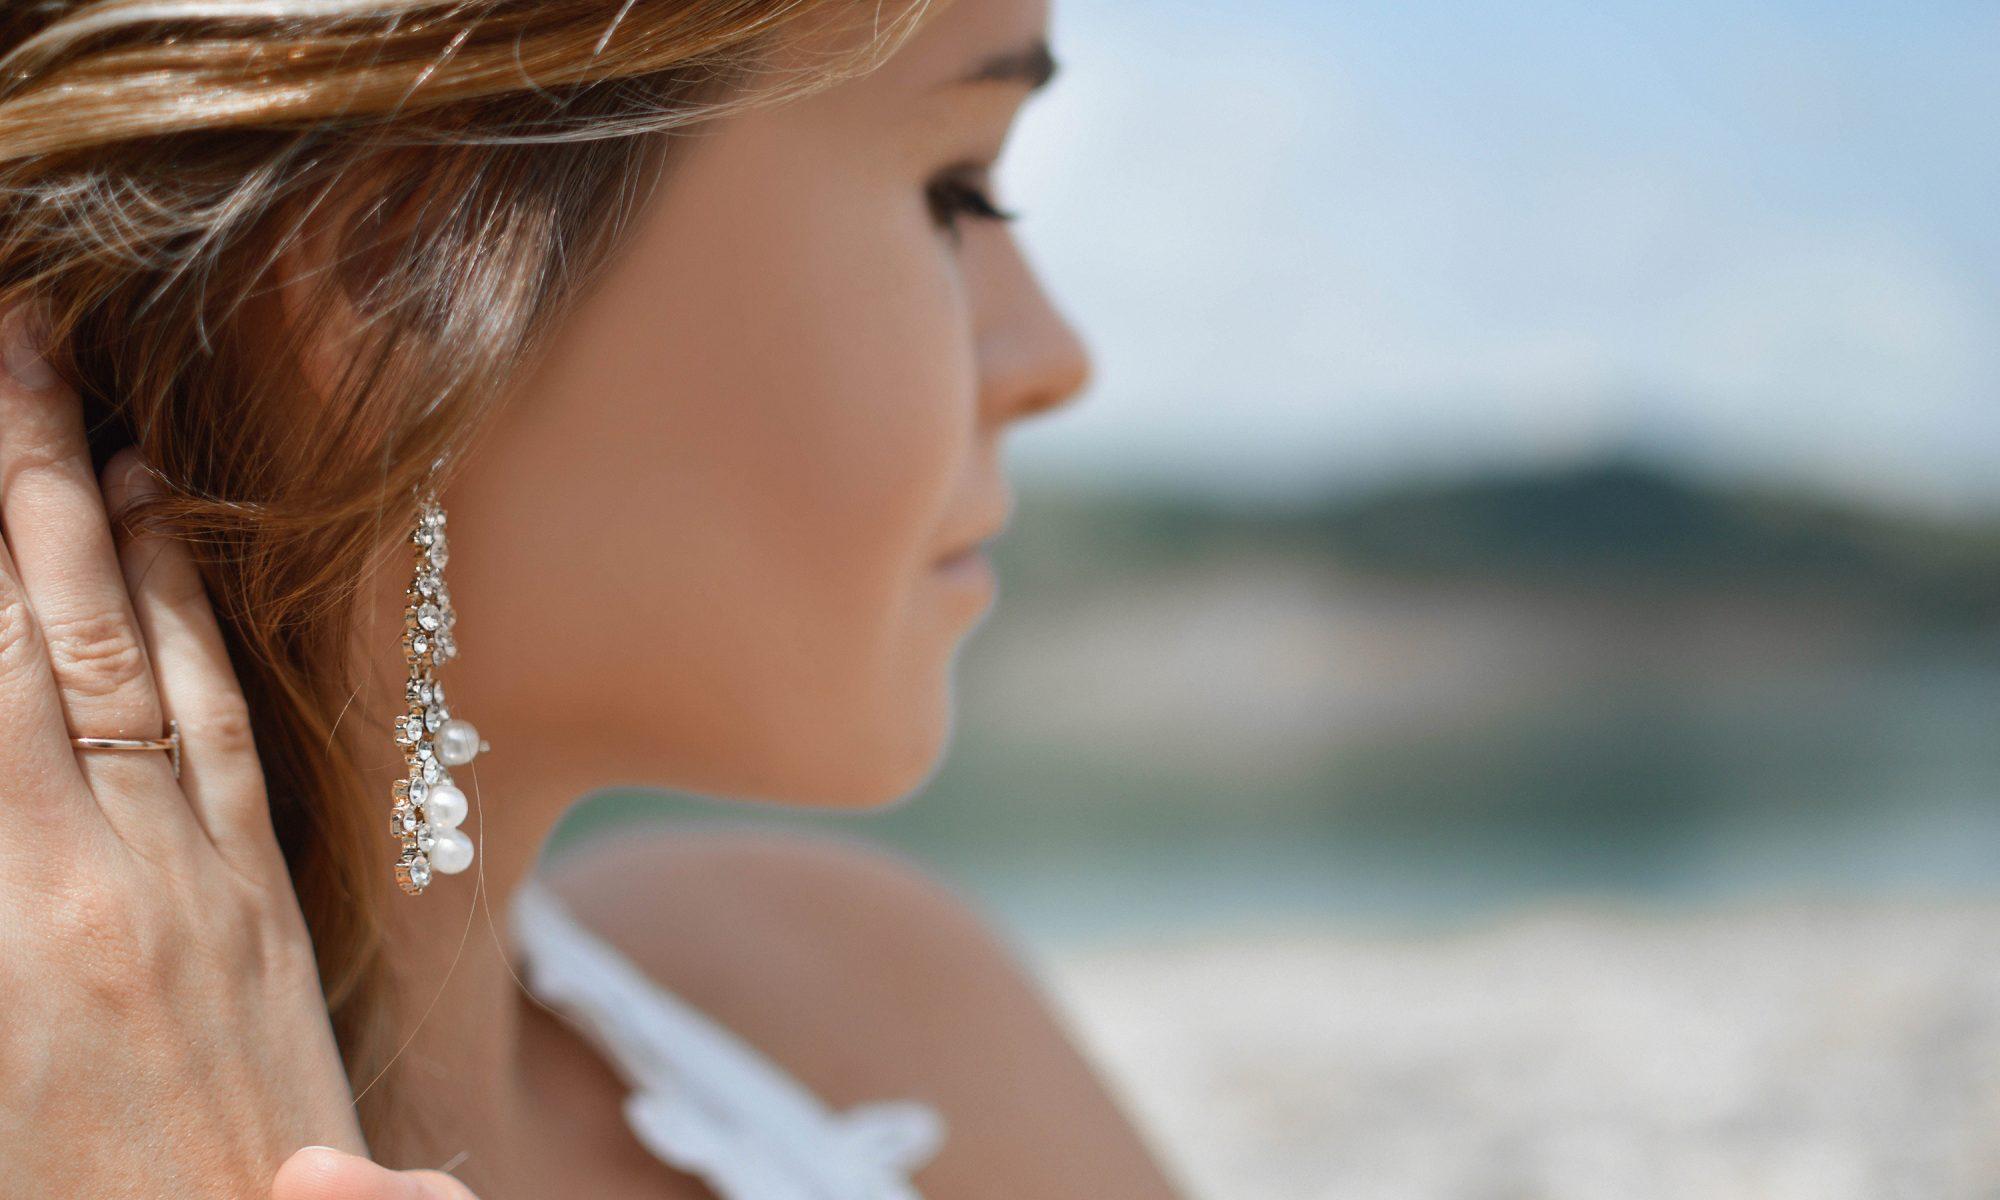 Miu Jewellery